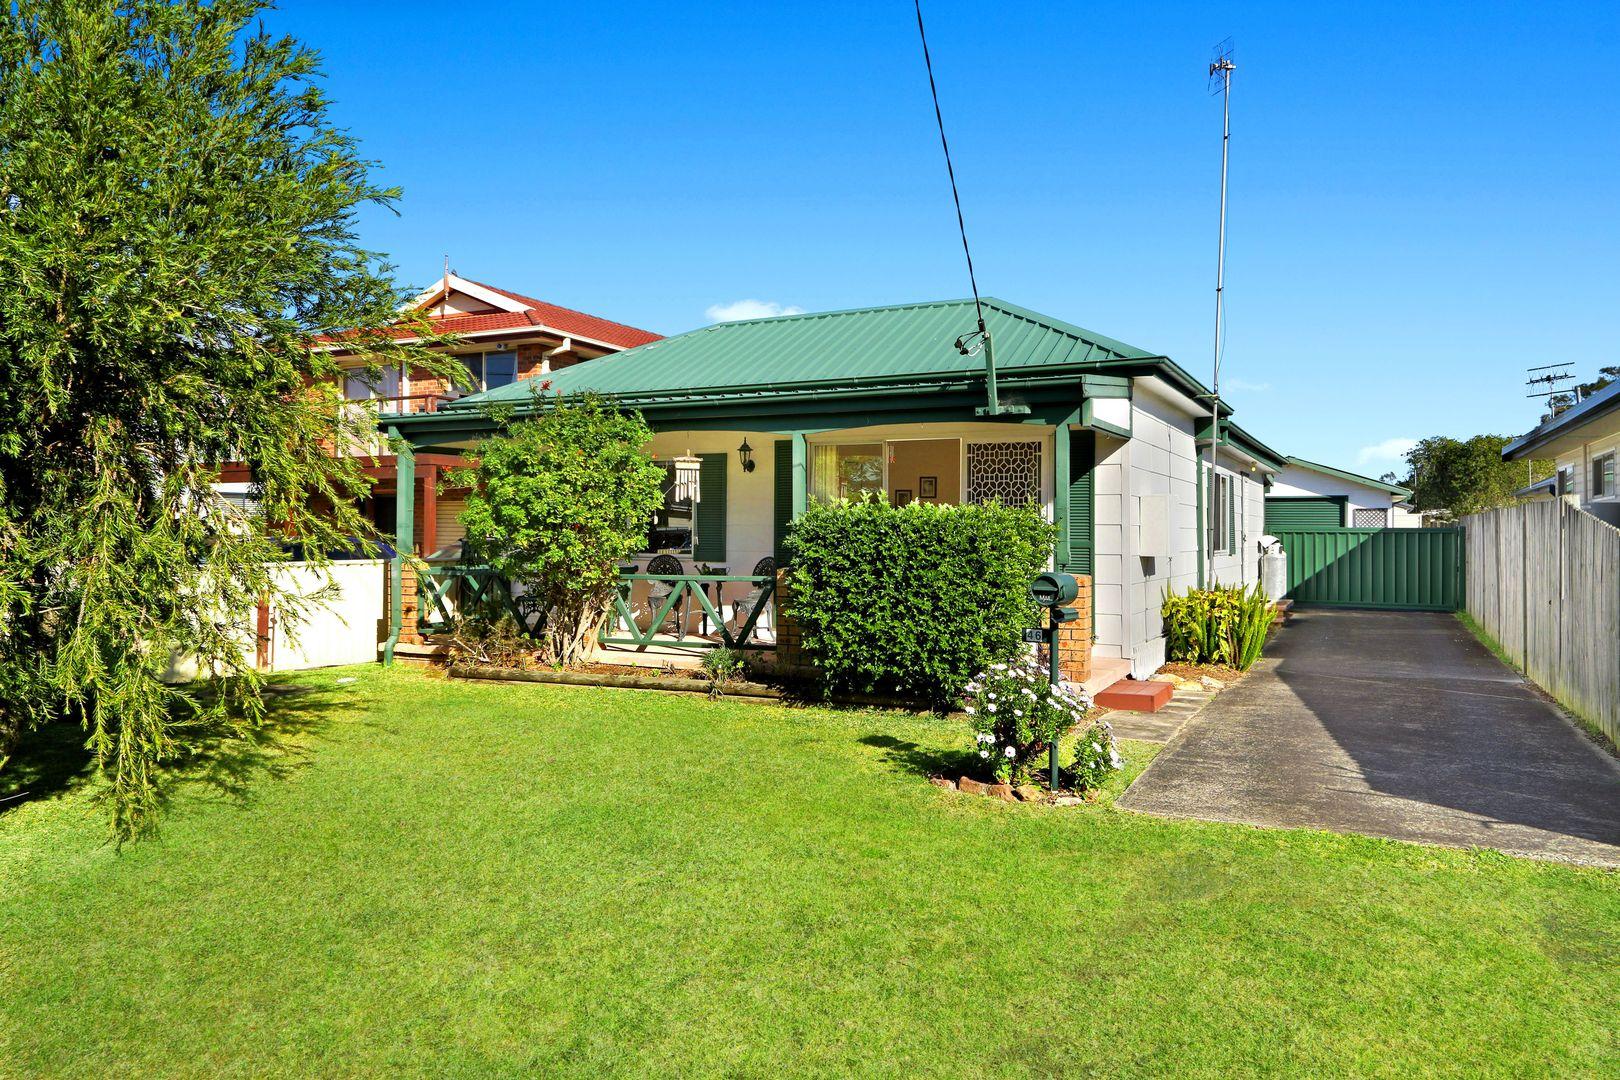 46 Grevillia Ave, Davistown NSW 2251, Image 0